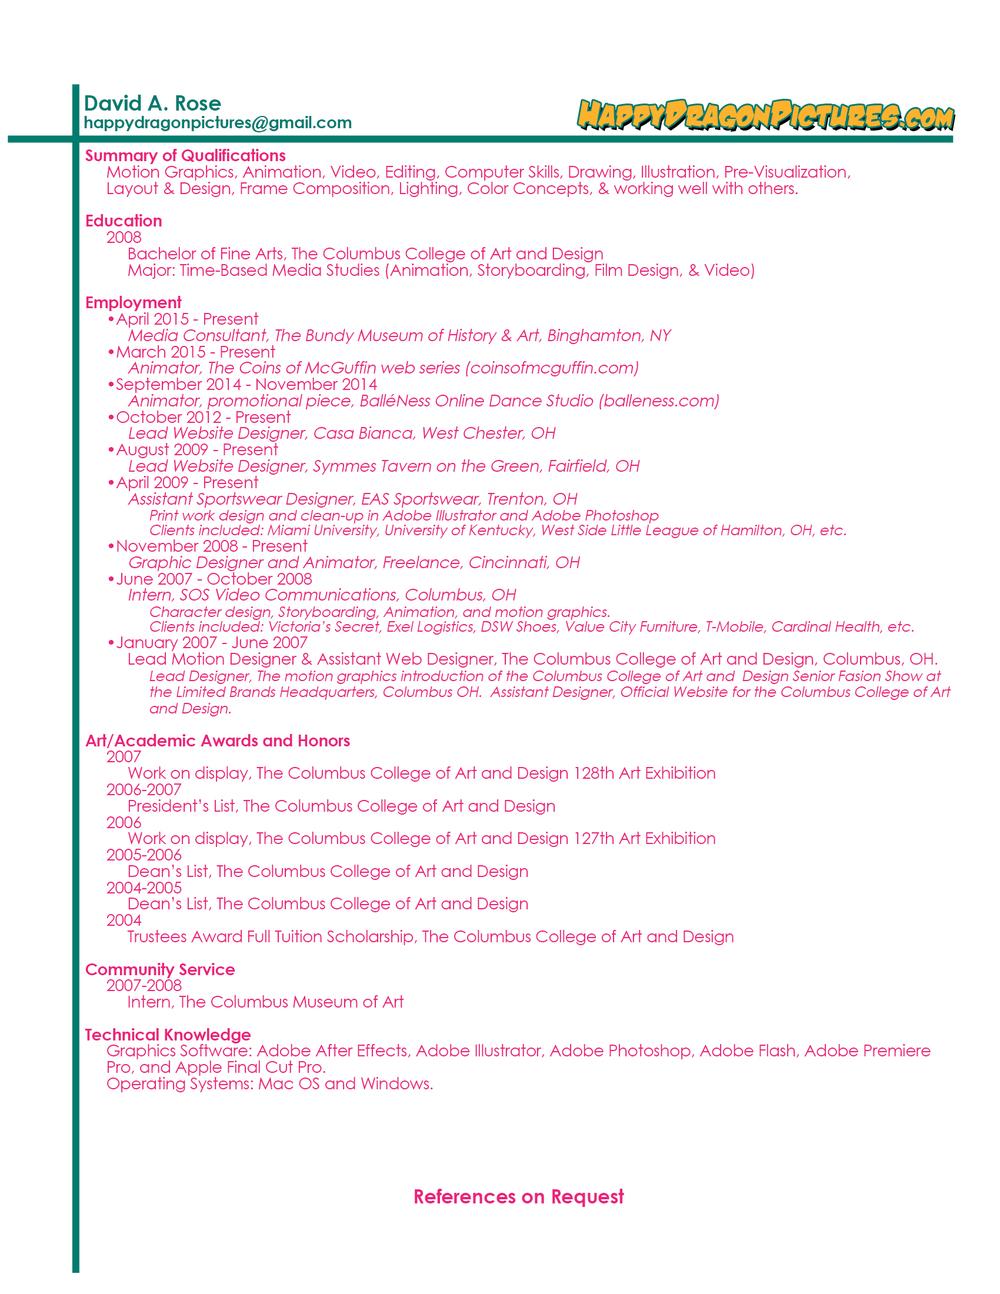 Resume2015.jpg